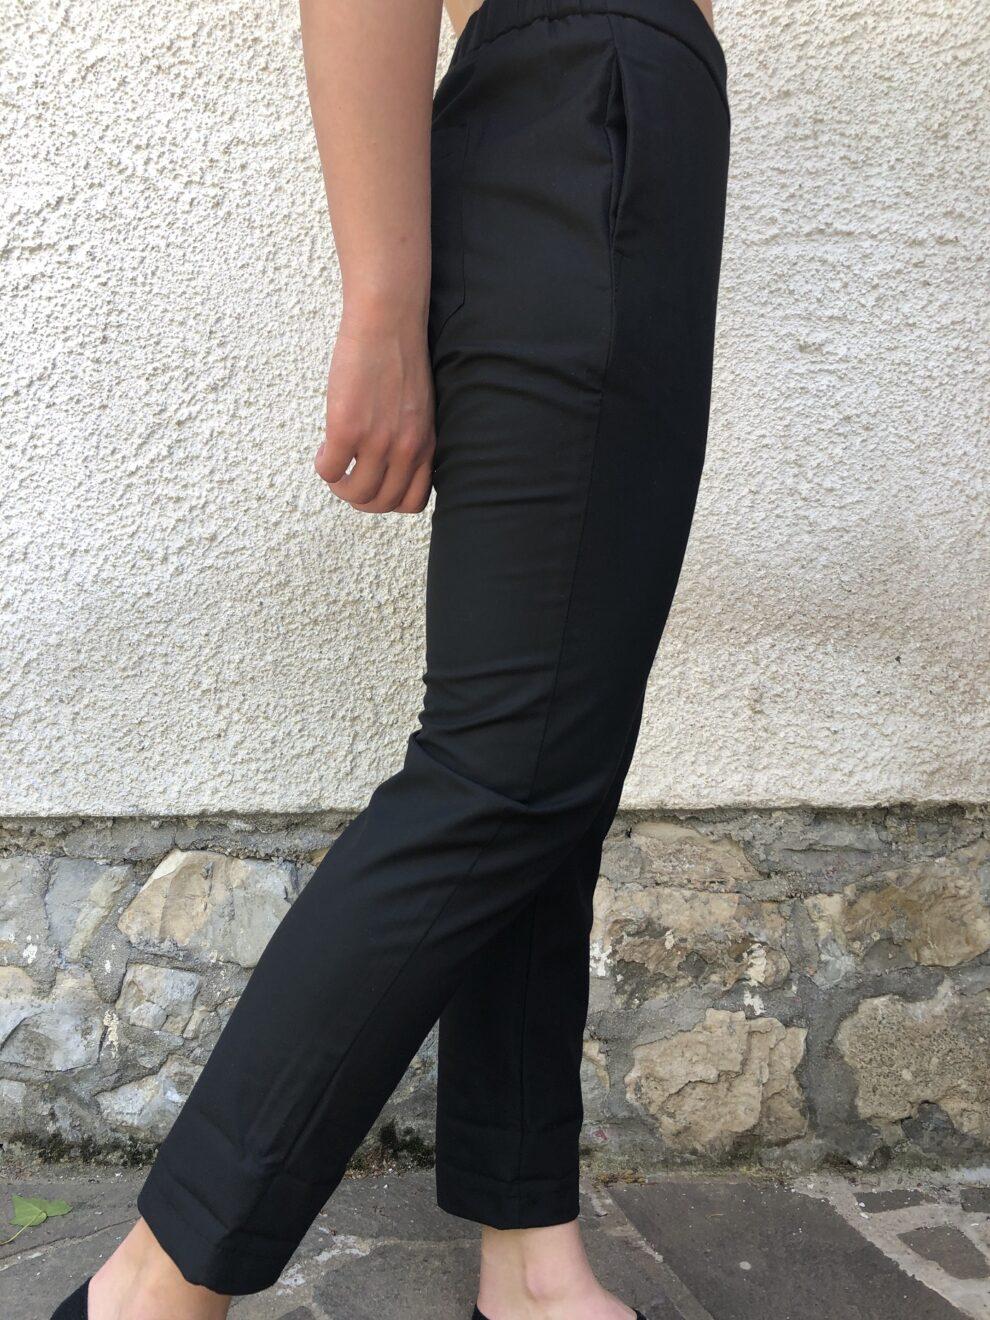 Pantalone Nero Nam particolare - tasca